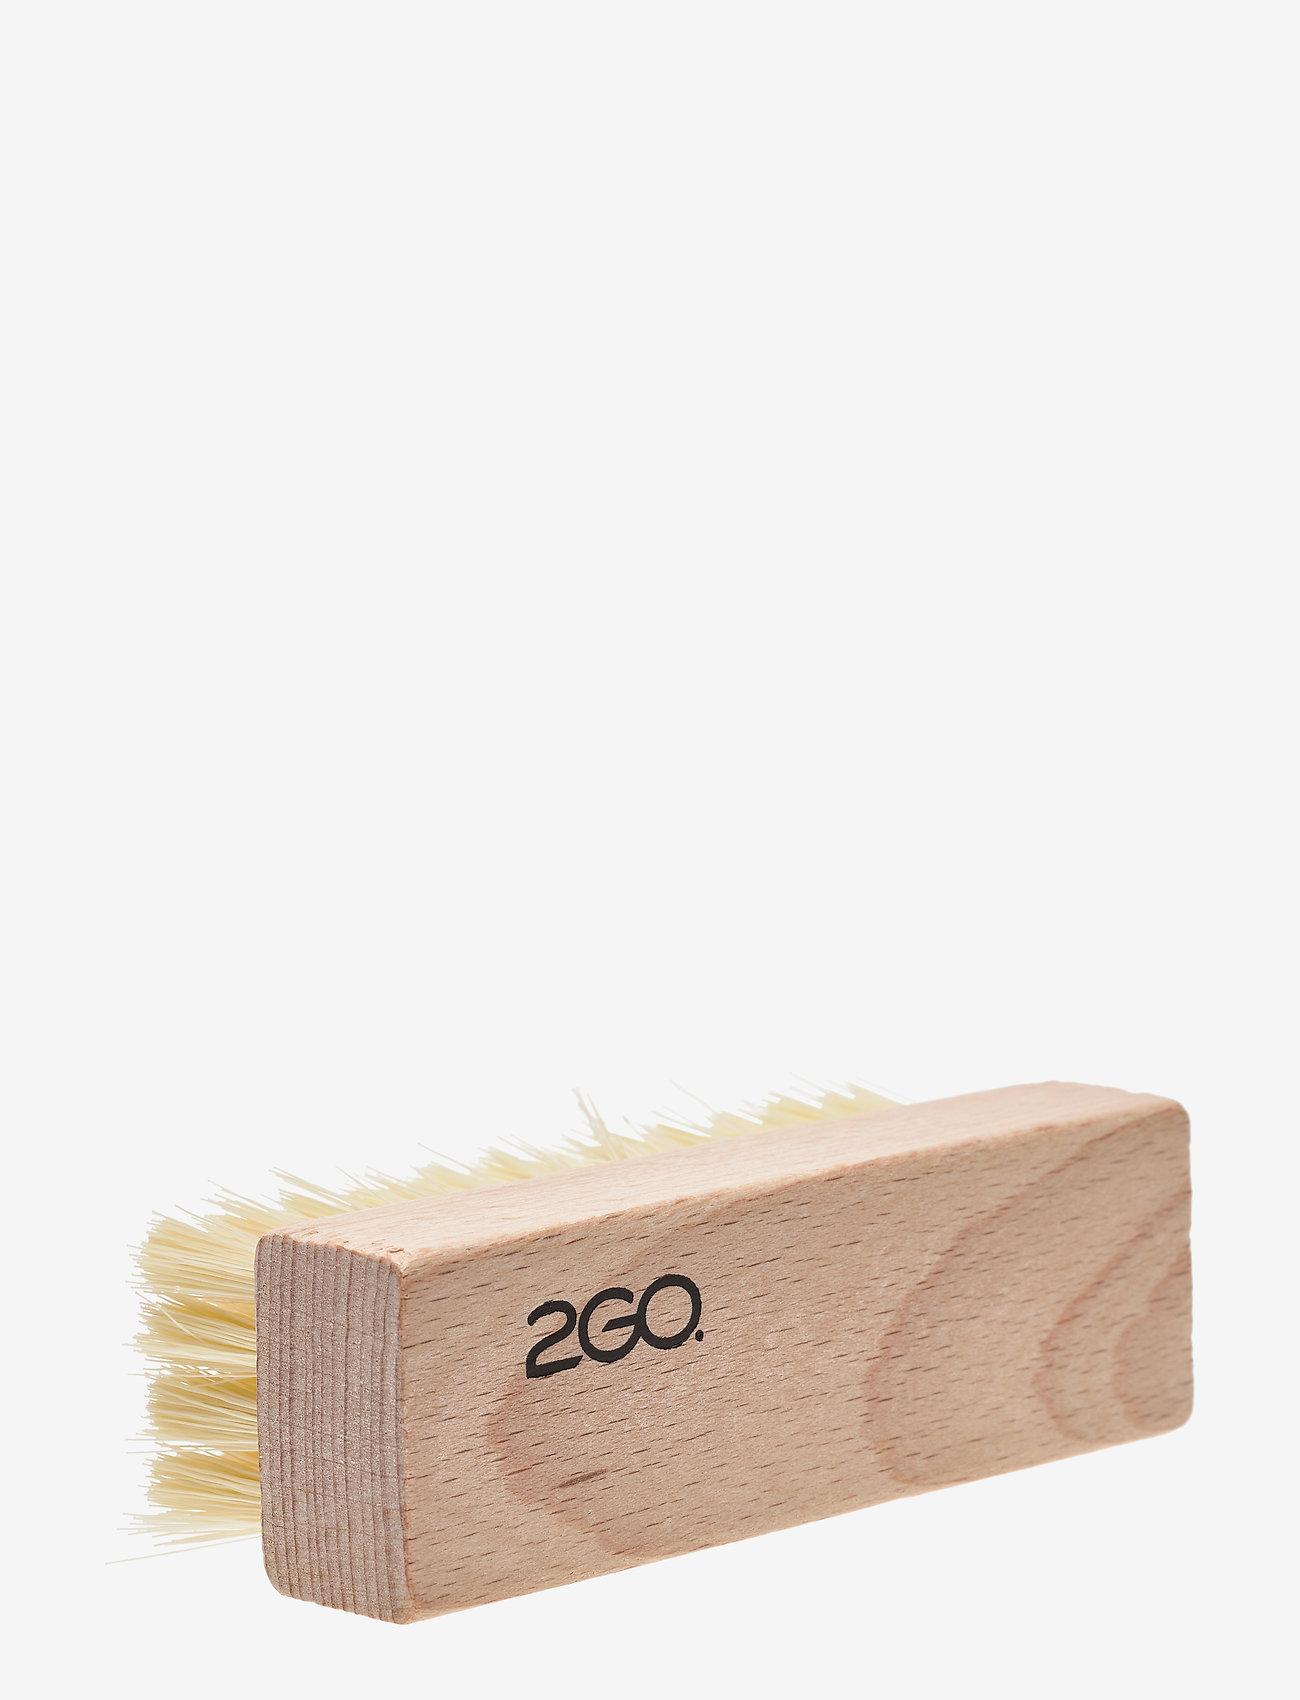 2GO - 2GO Cleaning brush - schuhschutz - beige - 1